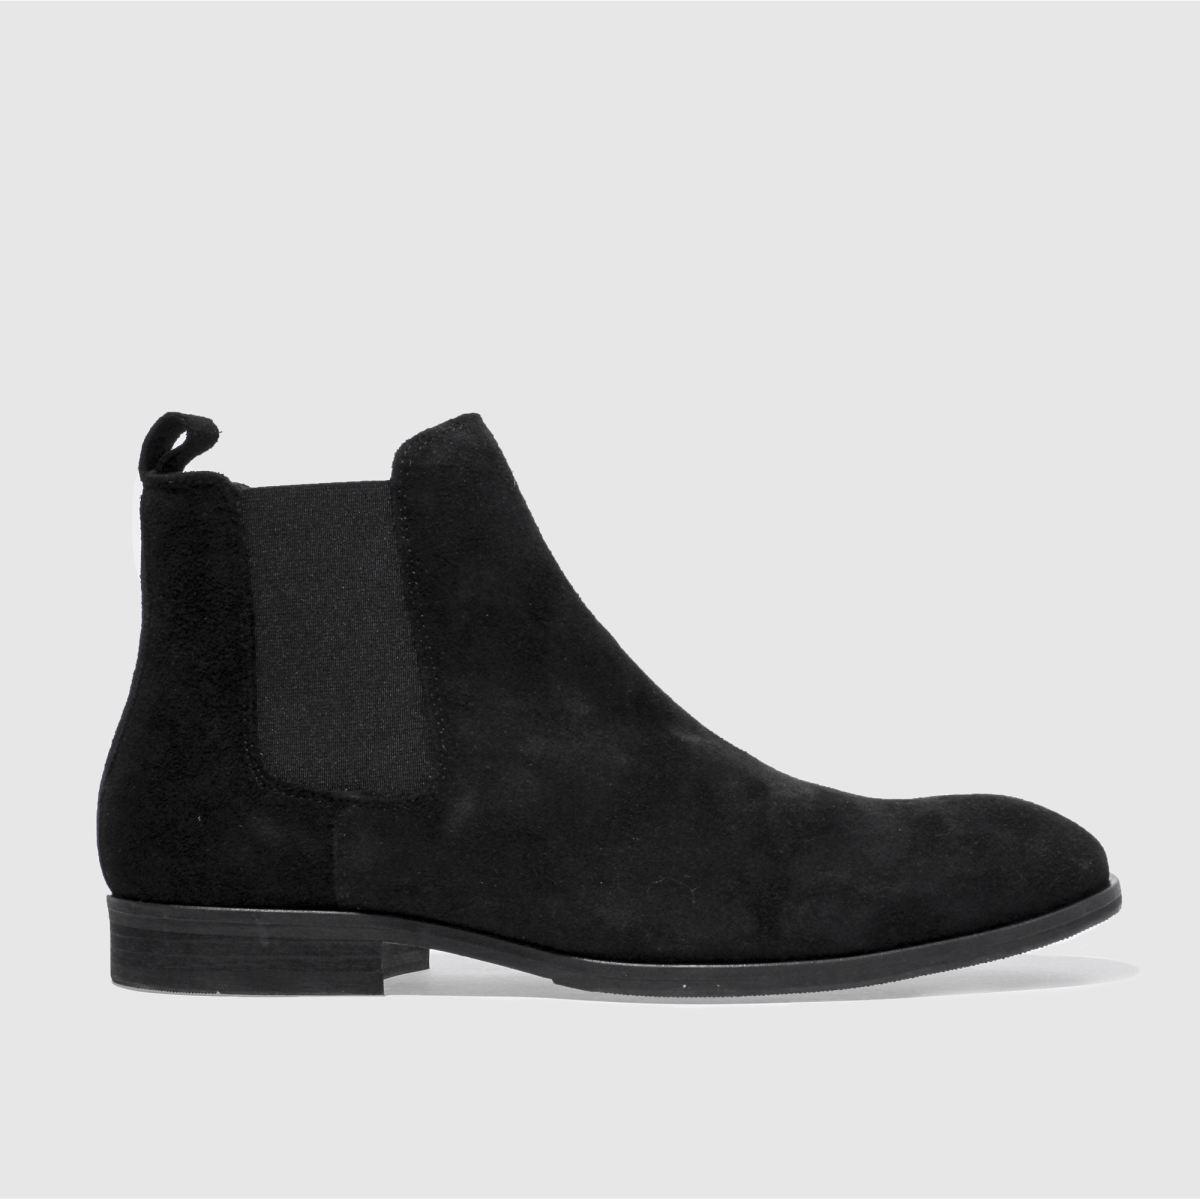 Schuh Black Khan Chelsea Boots